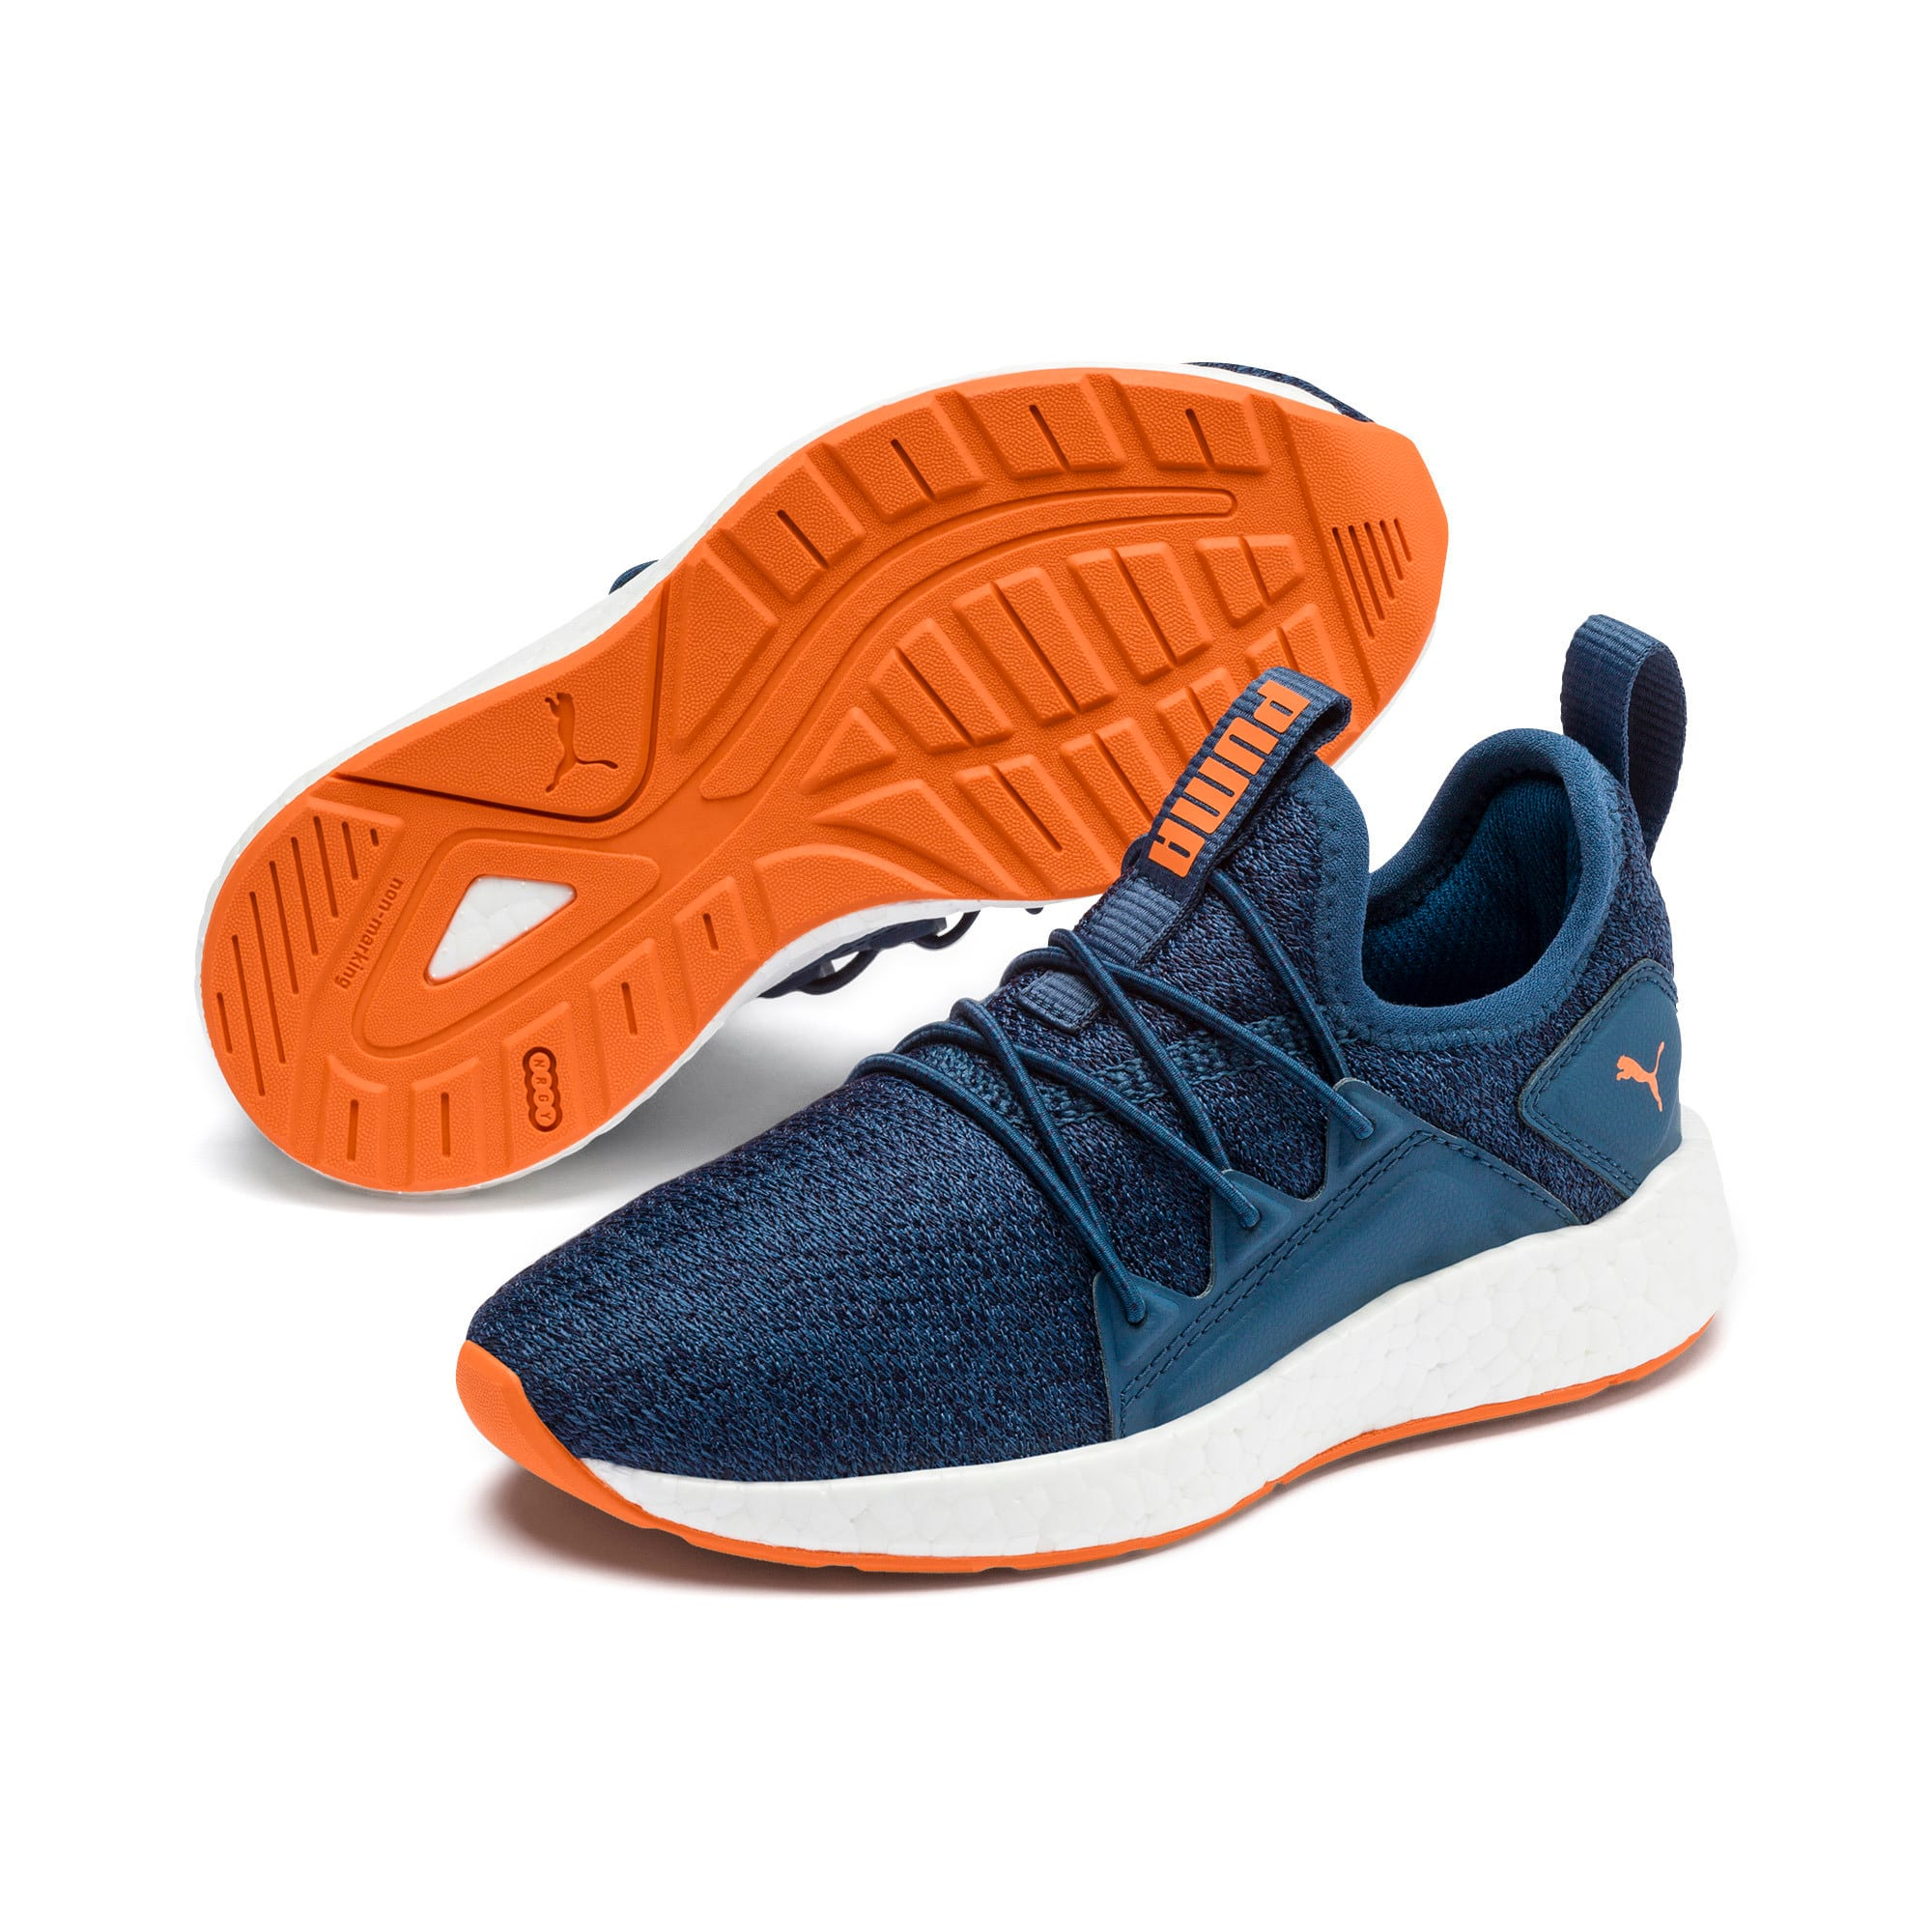 Miniatura 2 de Zapatos de punto NRGY Neko para PS, G Sea-Peacoat-J Orange-White, mediano